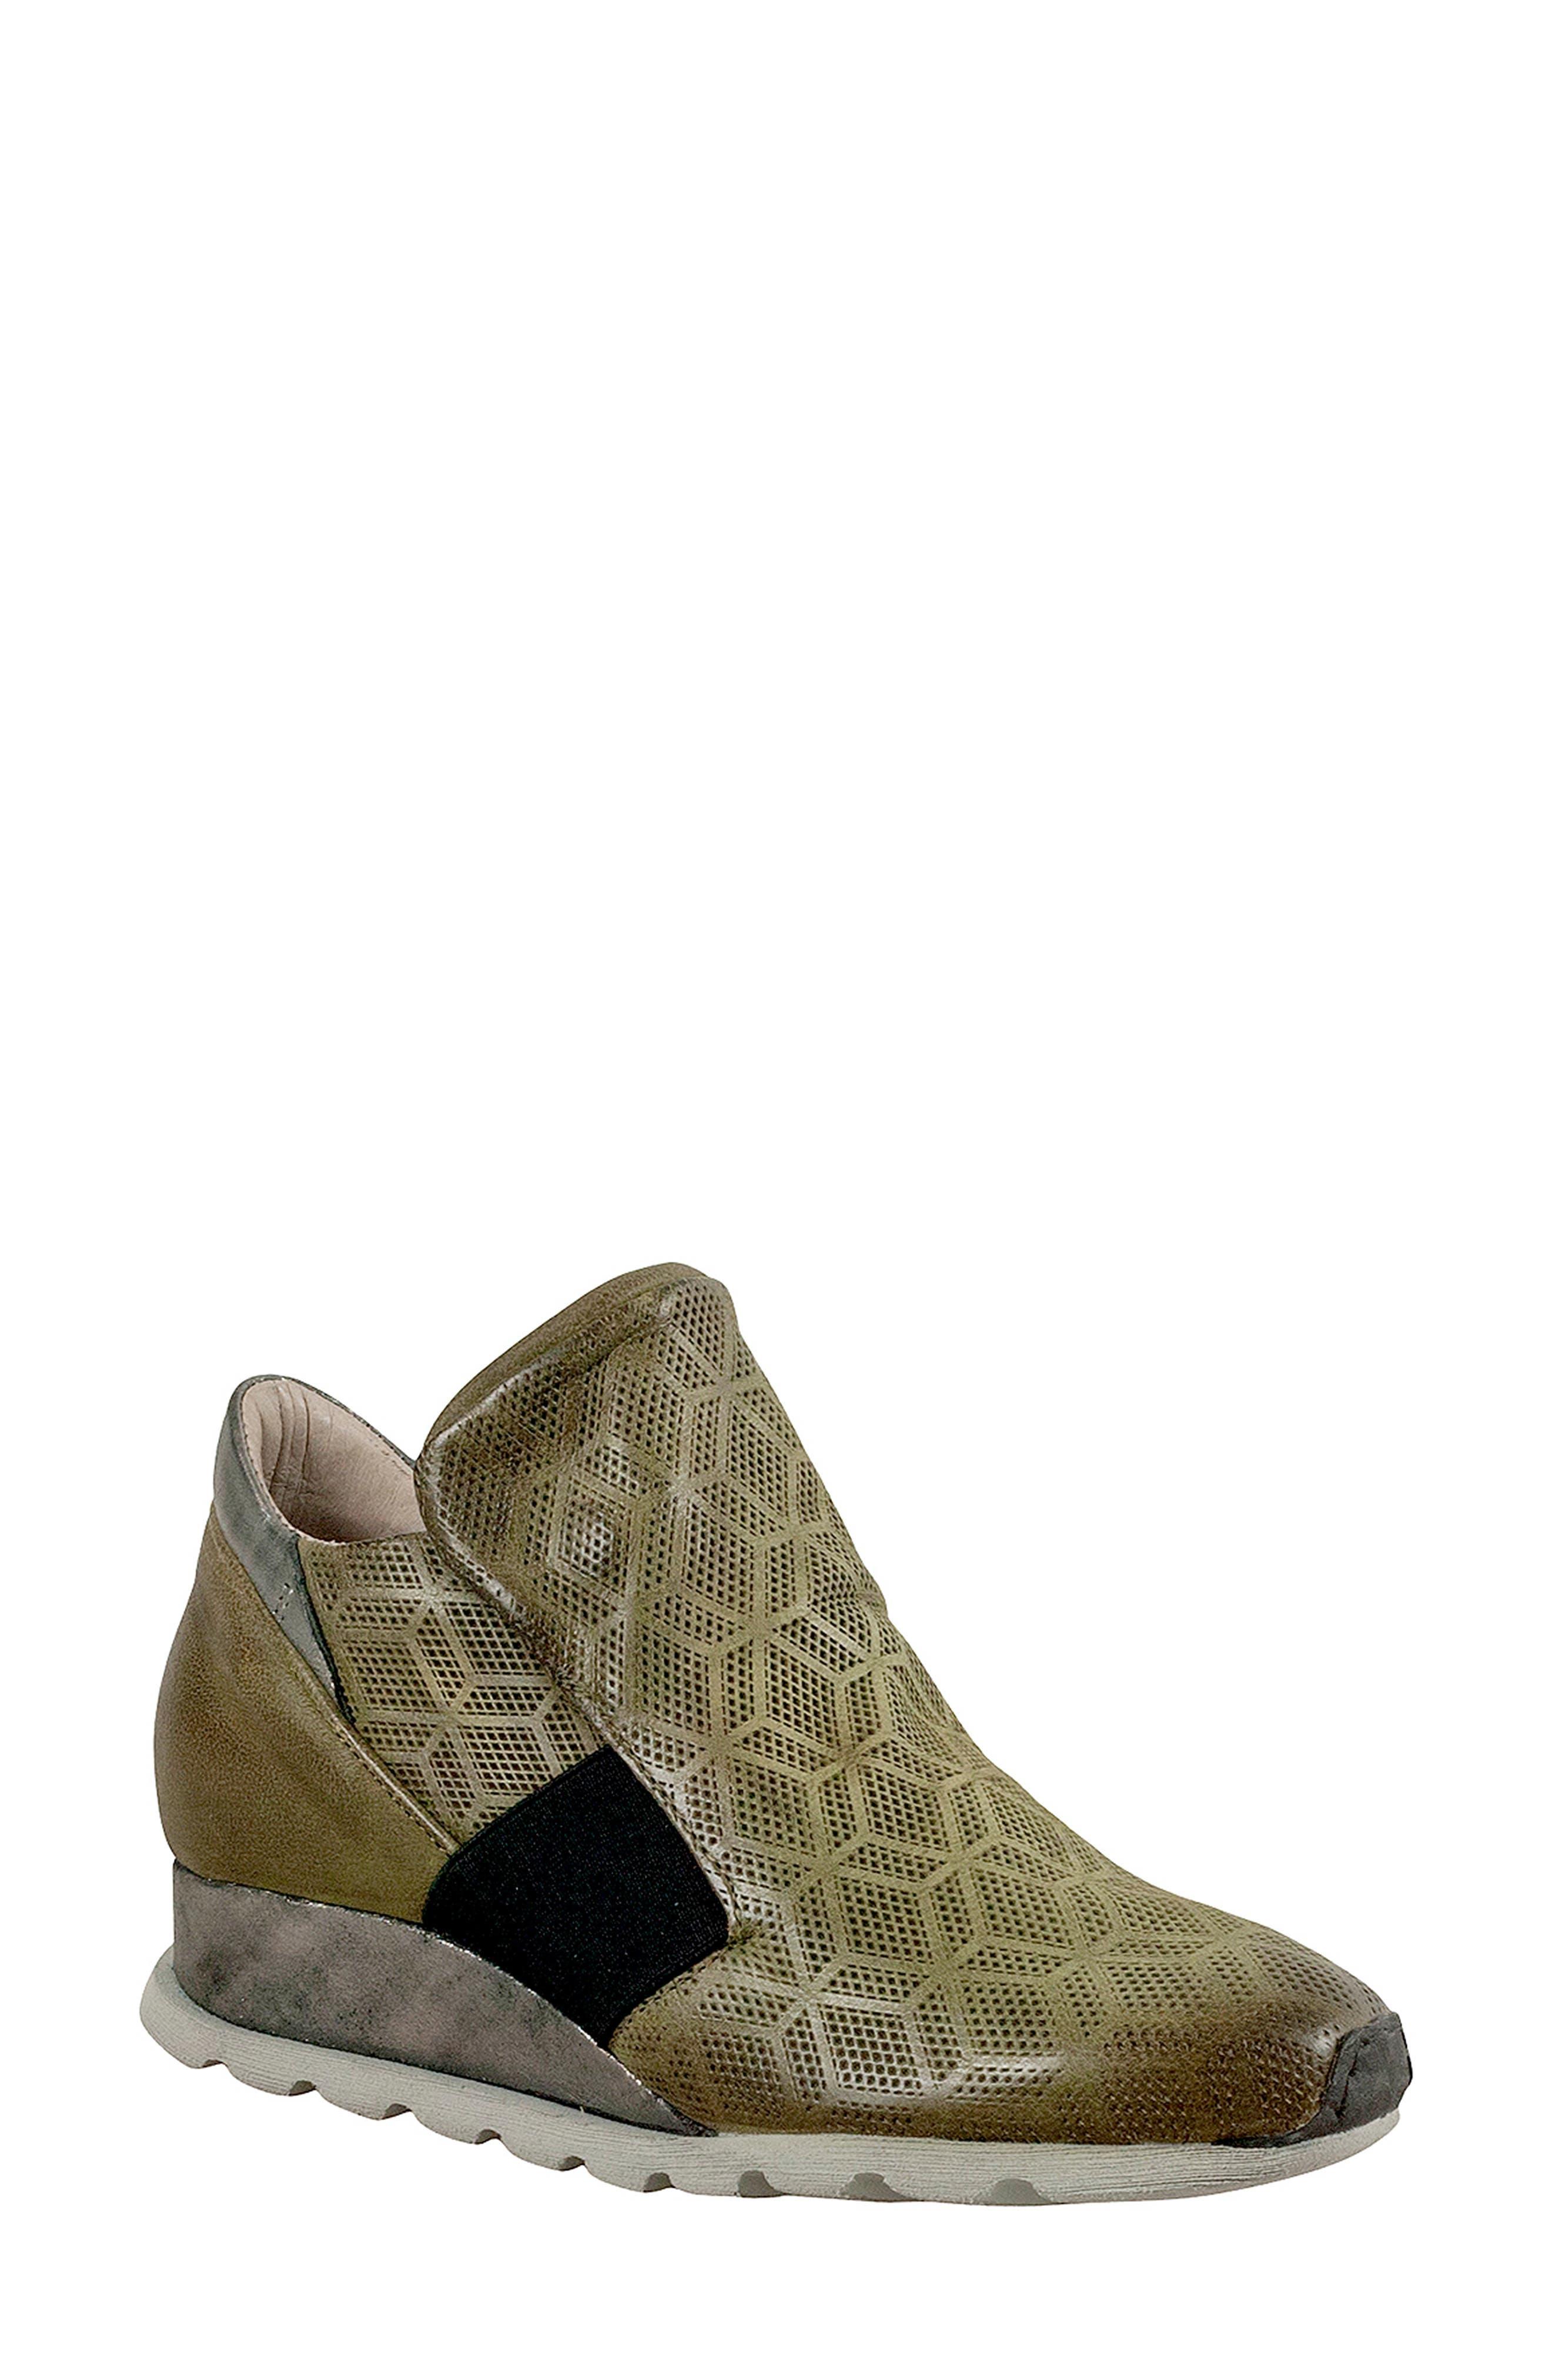 Miz Mooz Canarsie Sneaker, Green